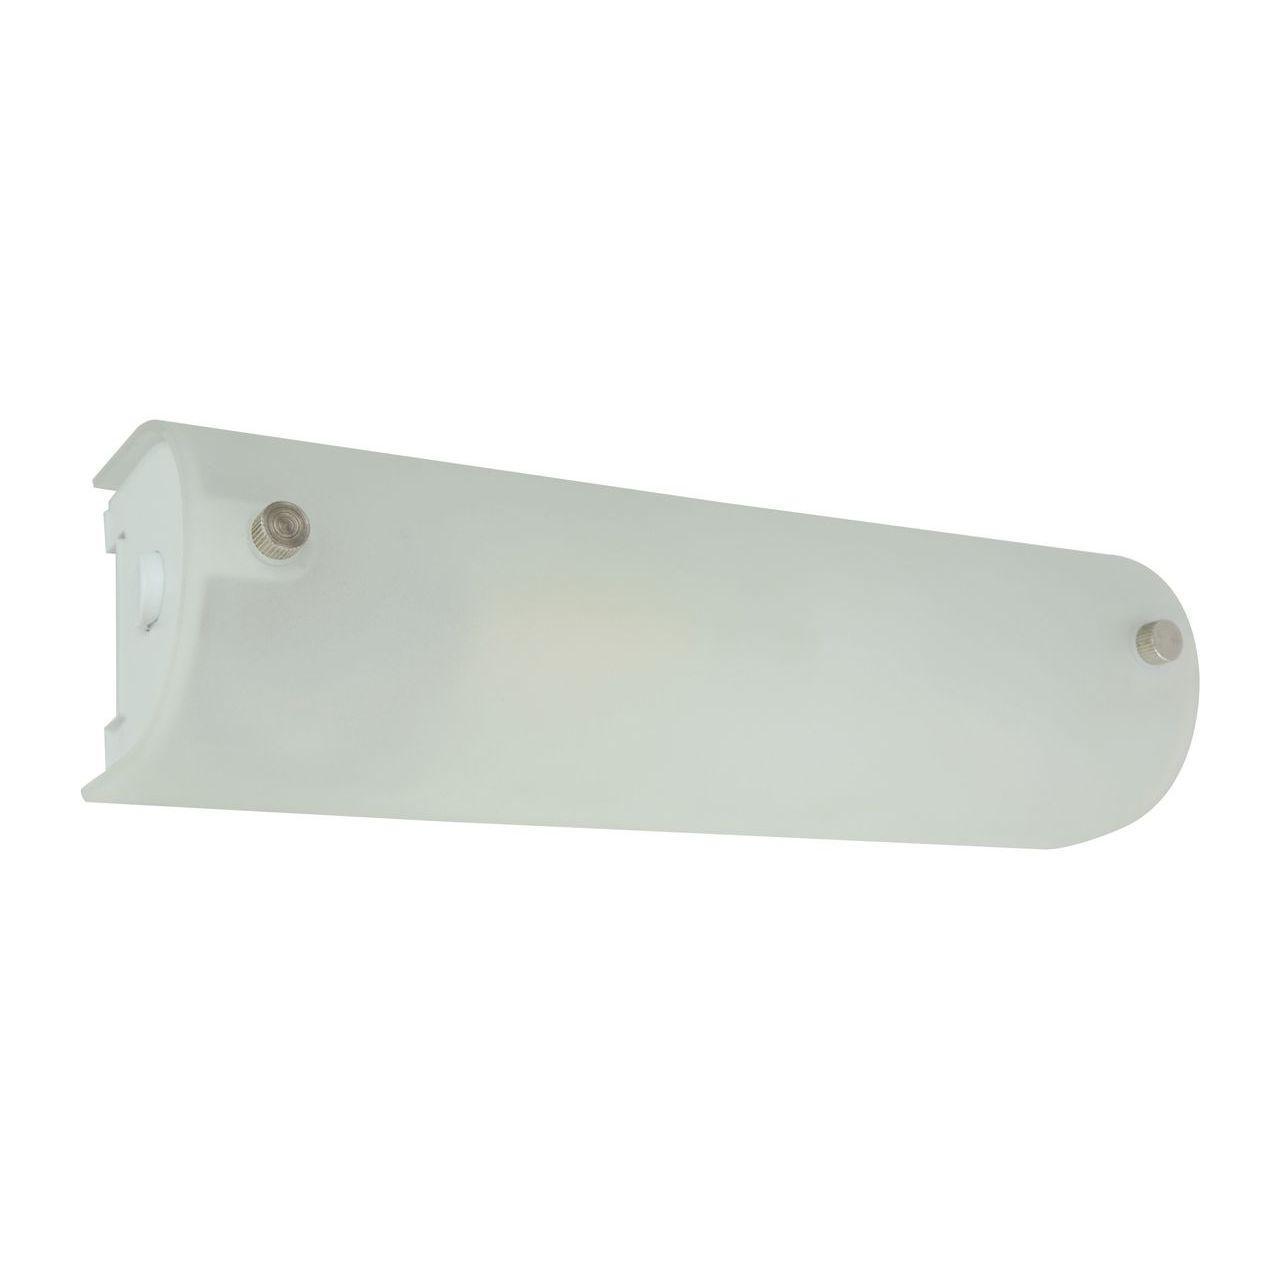 Фото - Подсветка для зеркал Arte Lamp Tratto A4101AP-1WH светильник arte lamp для зеркал tratto a4101ap 3wh